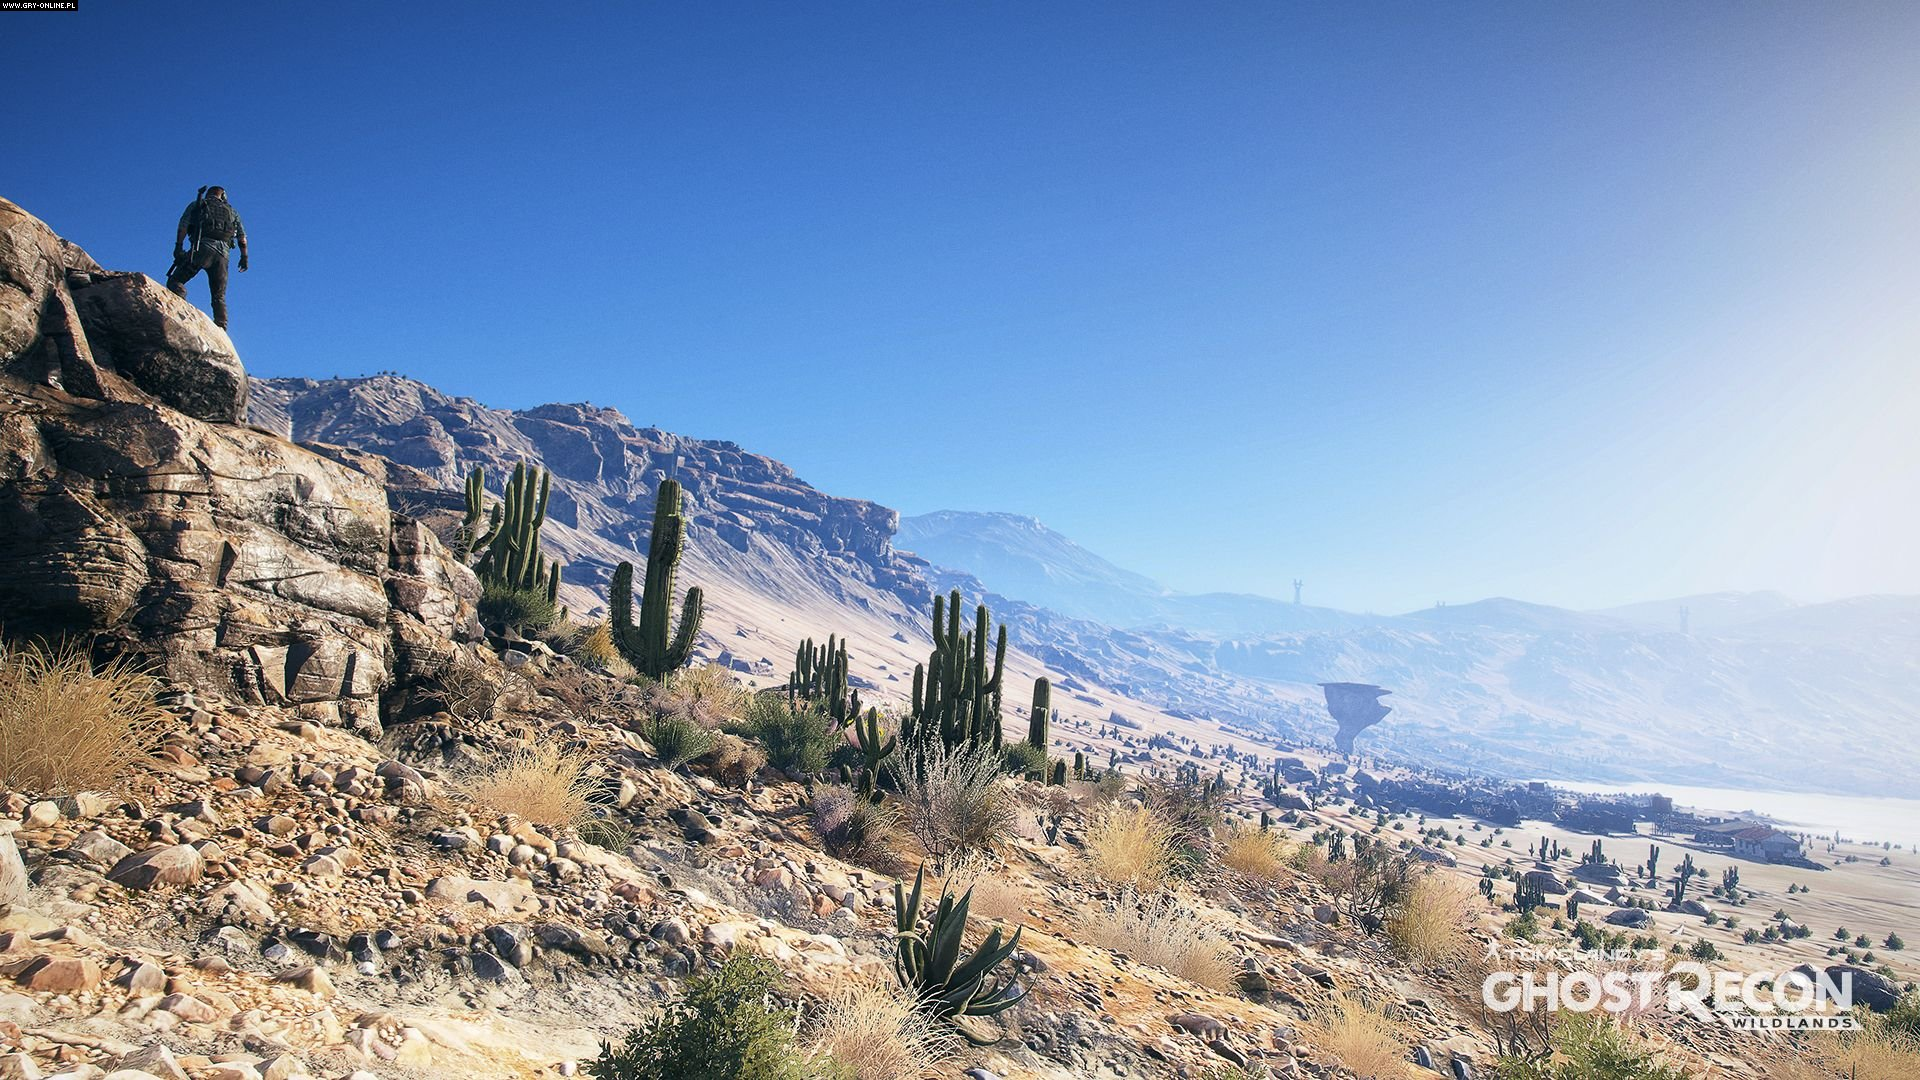 Tom Clancy's Ghost Recon: Wildlands PC, PS4, XONE Games Image 57/57, Ubisoft